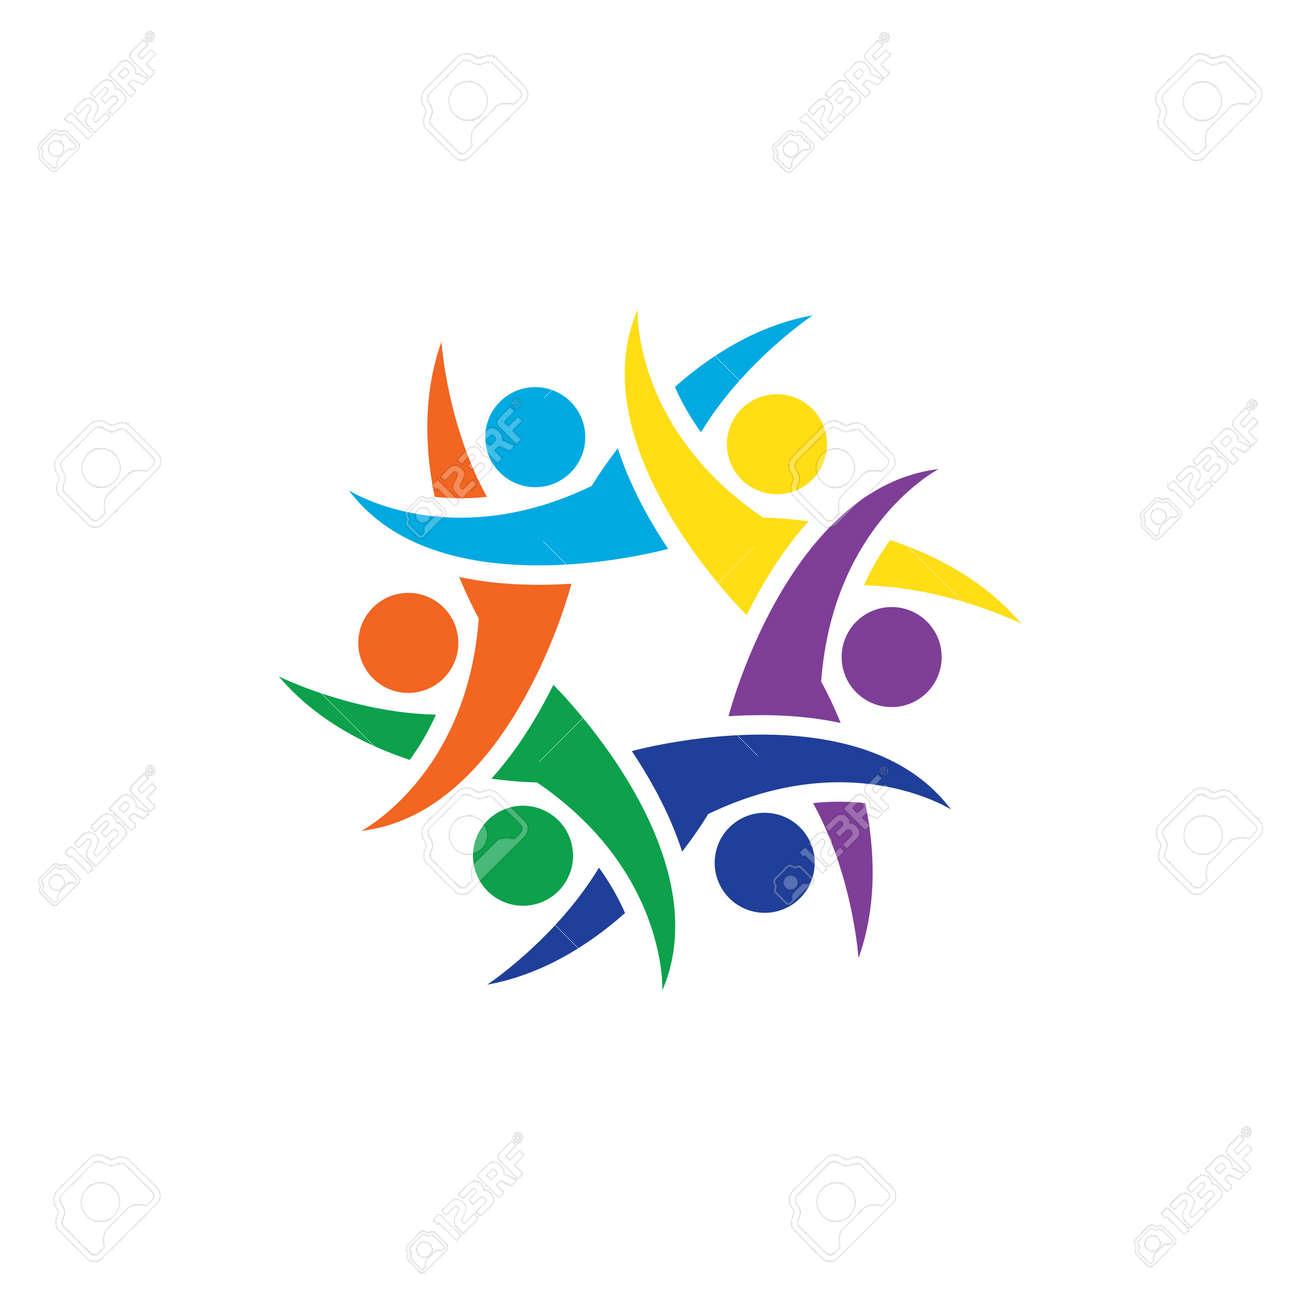 Community, network and social logo design - 158393962